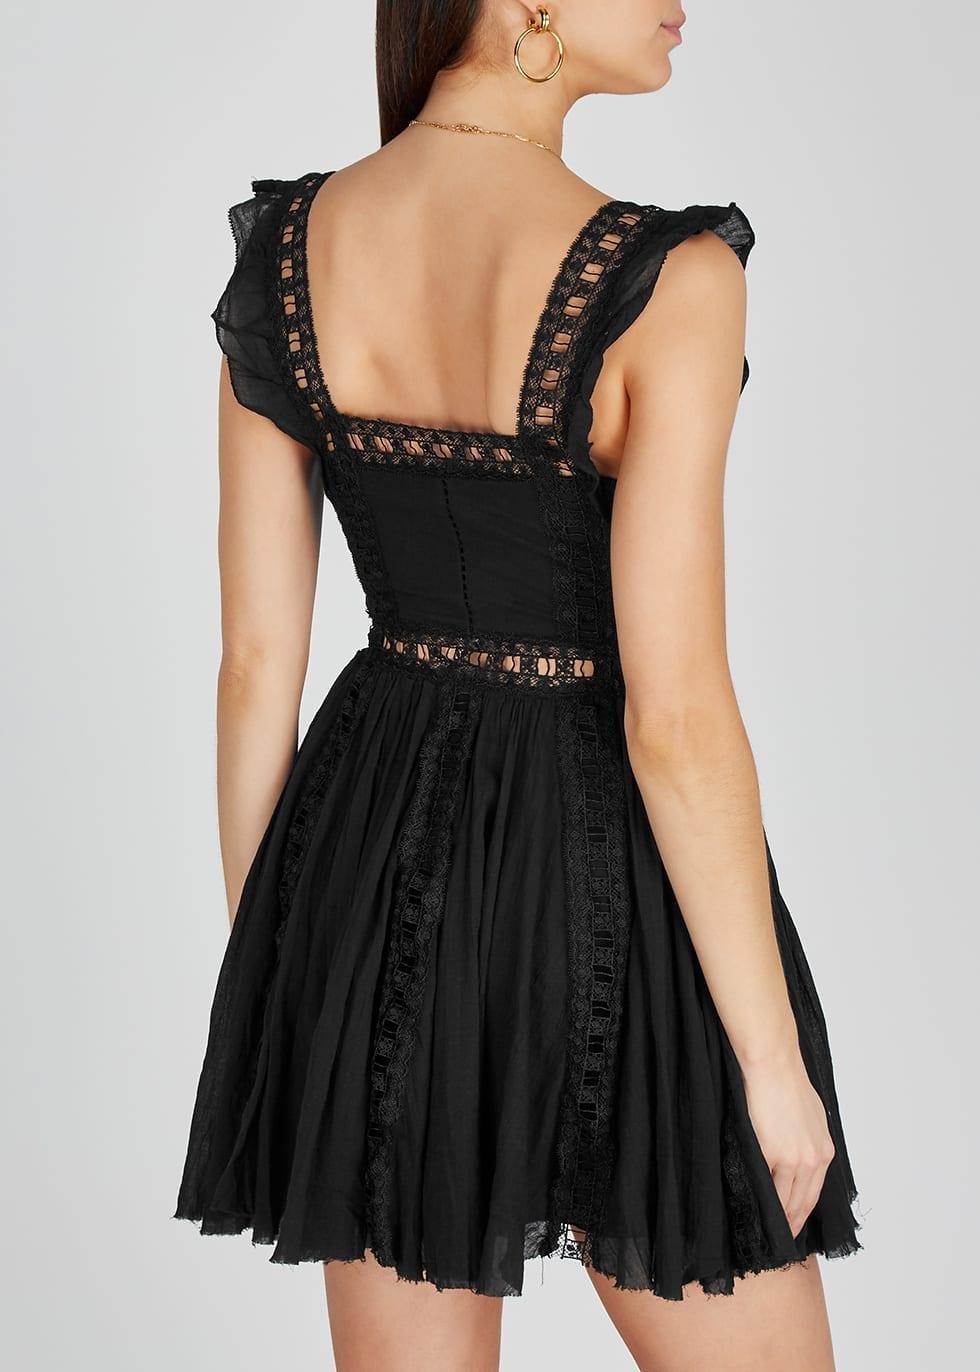 FREE PEOPLE Verona Black Cotton Mini Dress